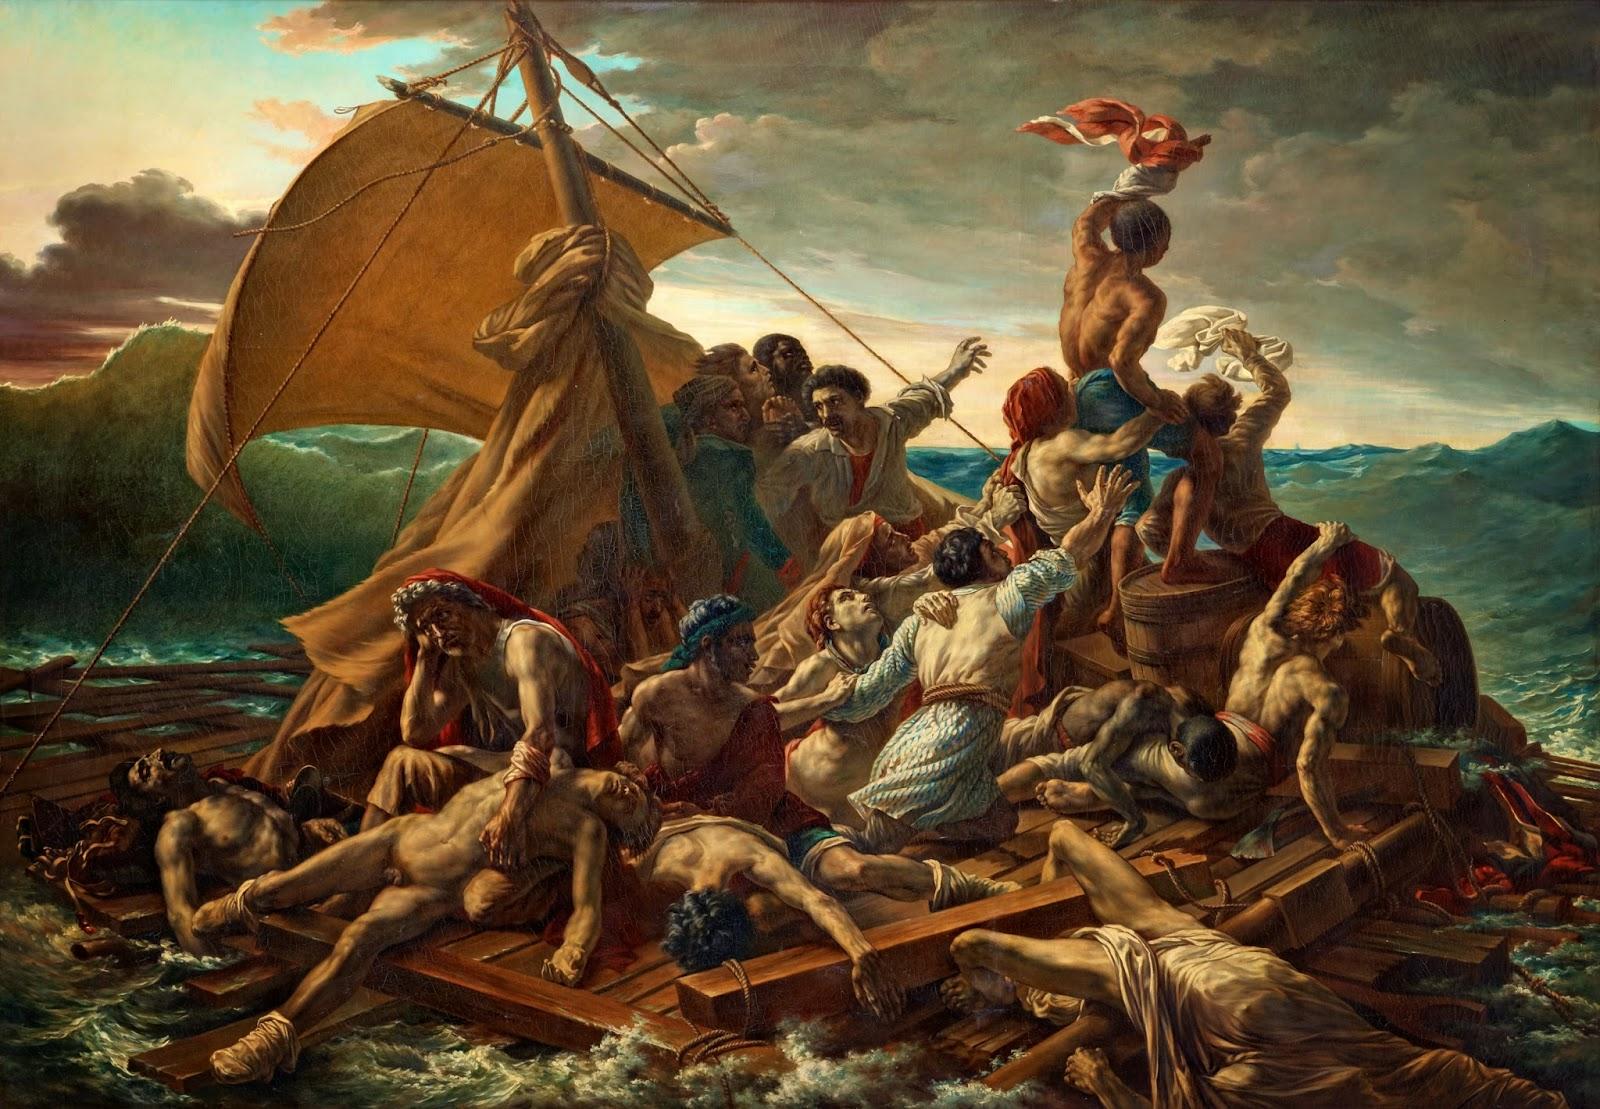 Talk:The Raft of the Medusa